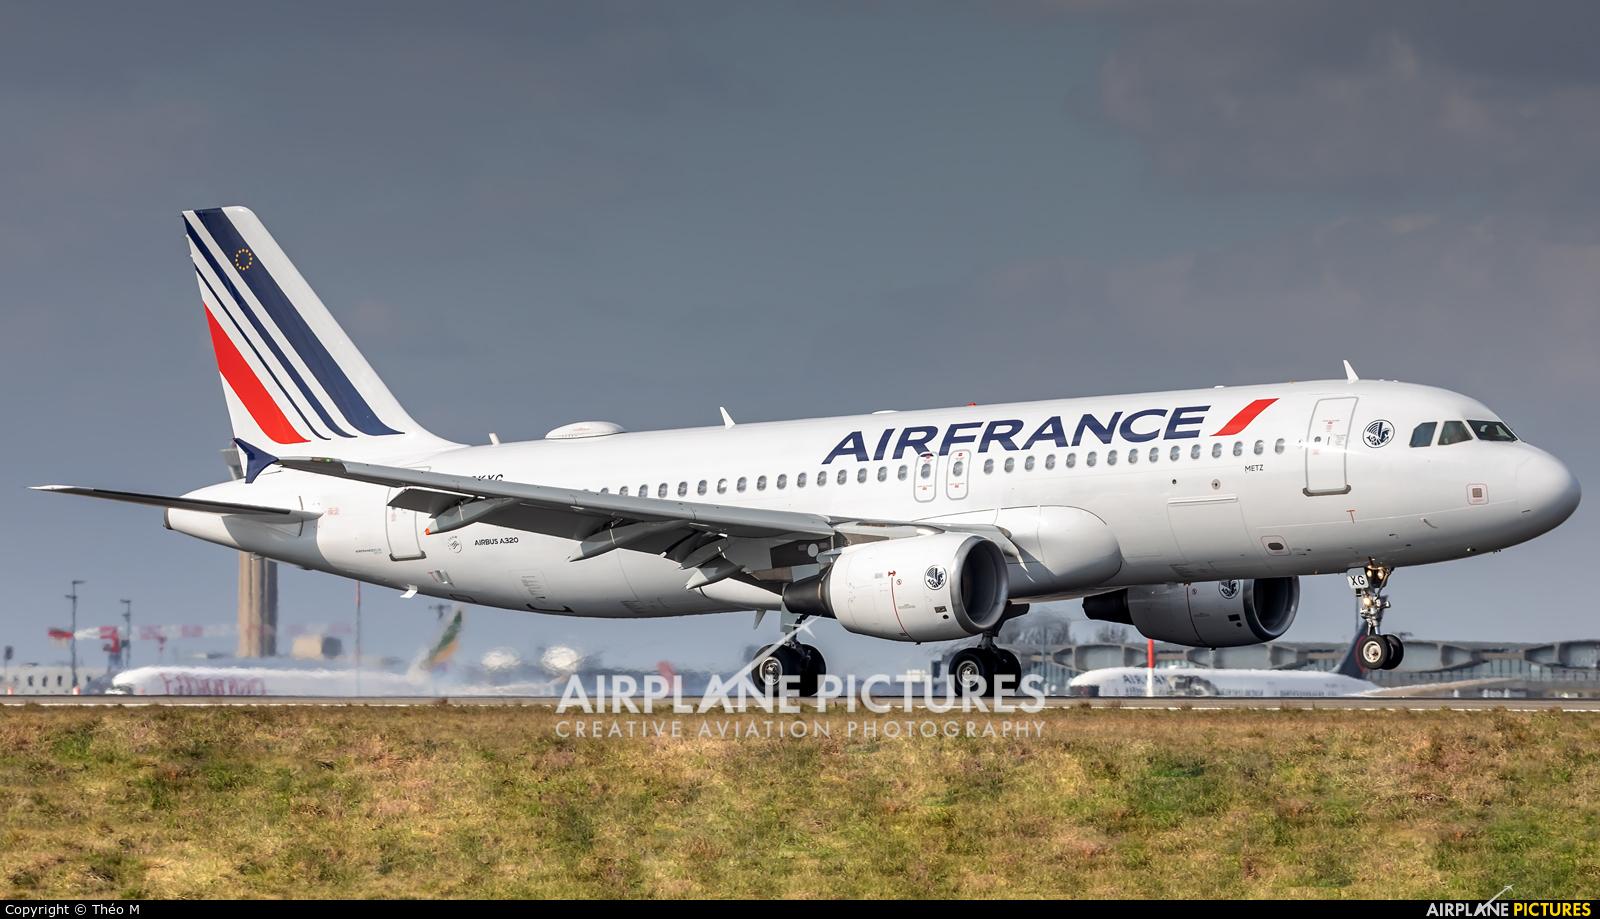 Air France F-GKXG aircraft at Paris - Charles de Gaulle